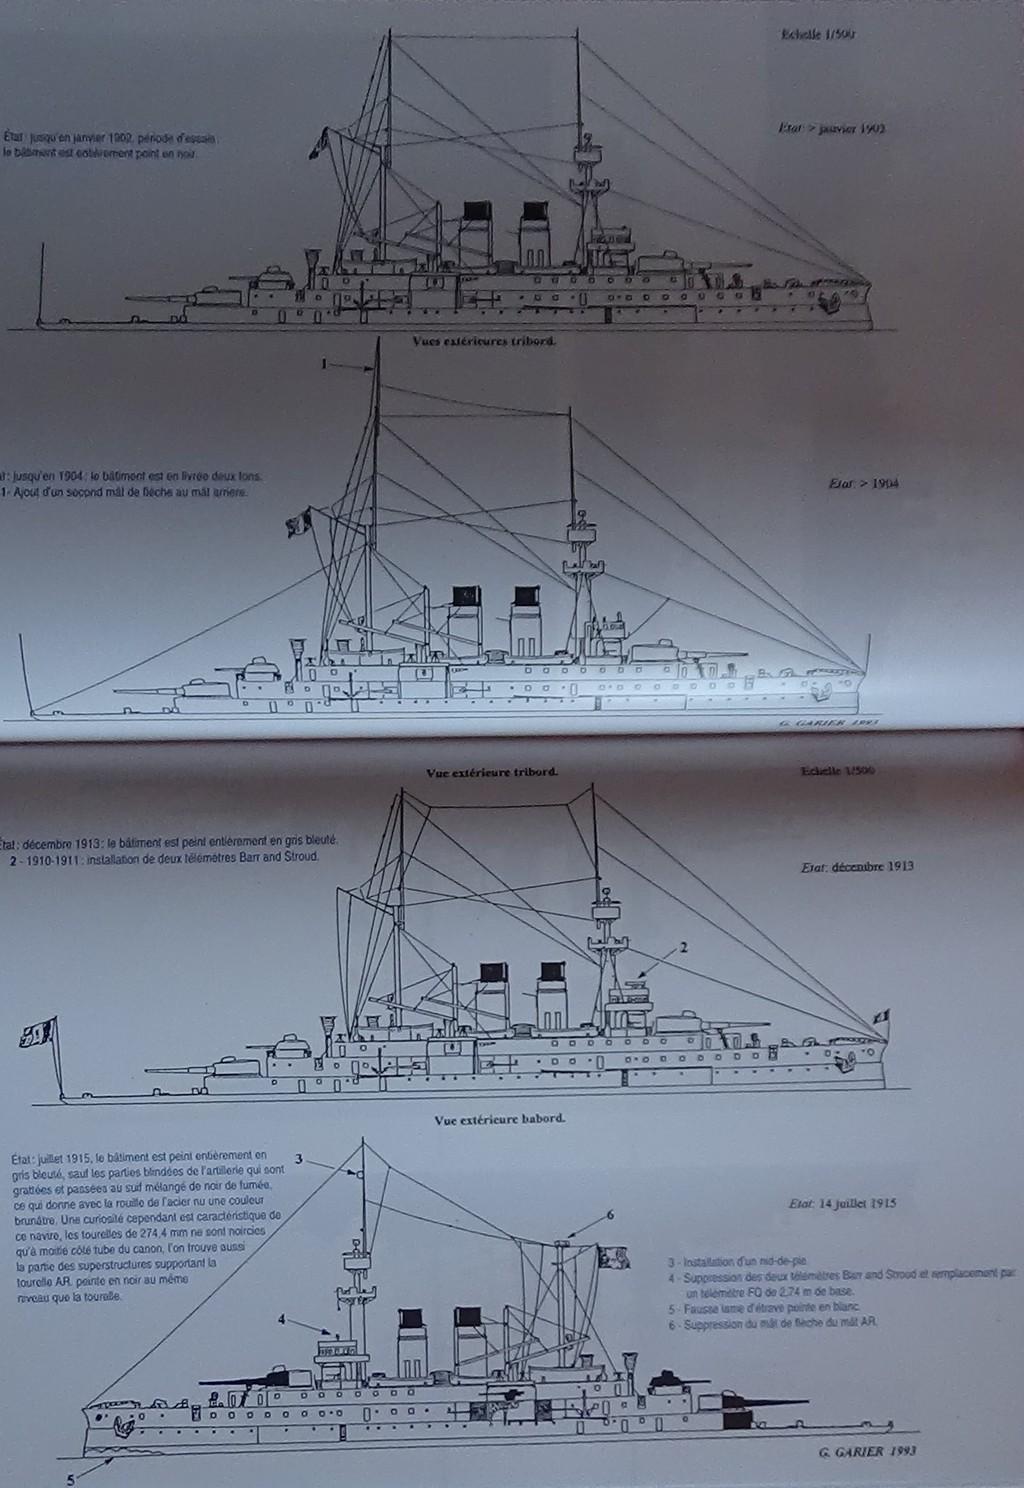 Derniers Achats (3) - Page 25 PewyLb-Echantillons-8